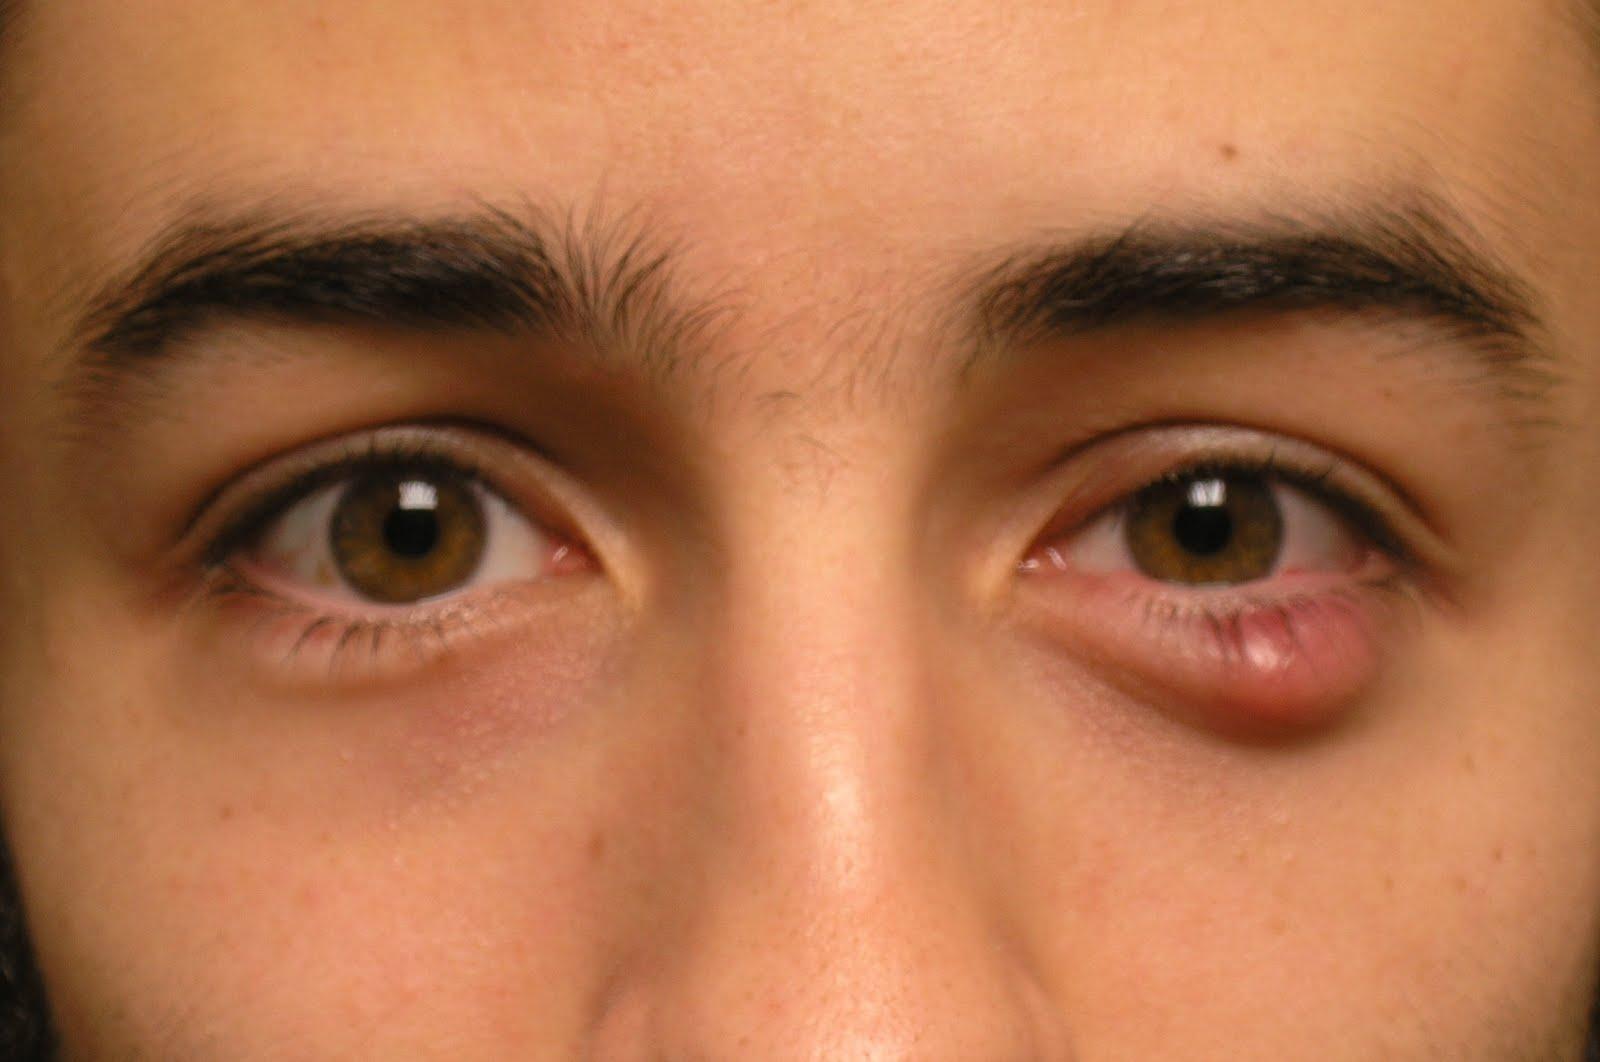 Chlamydia In The Eye Chalazion